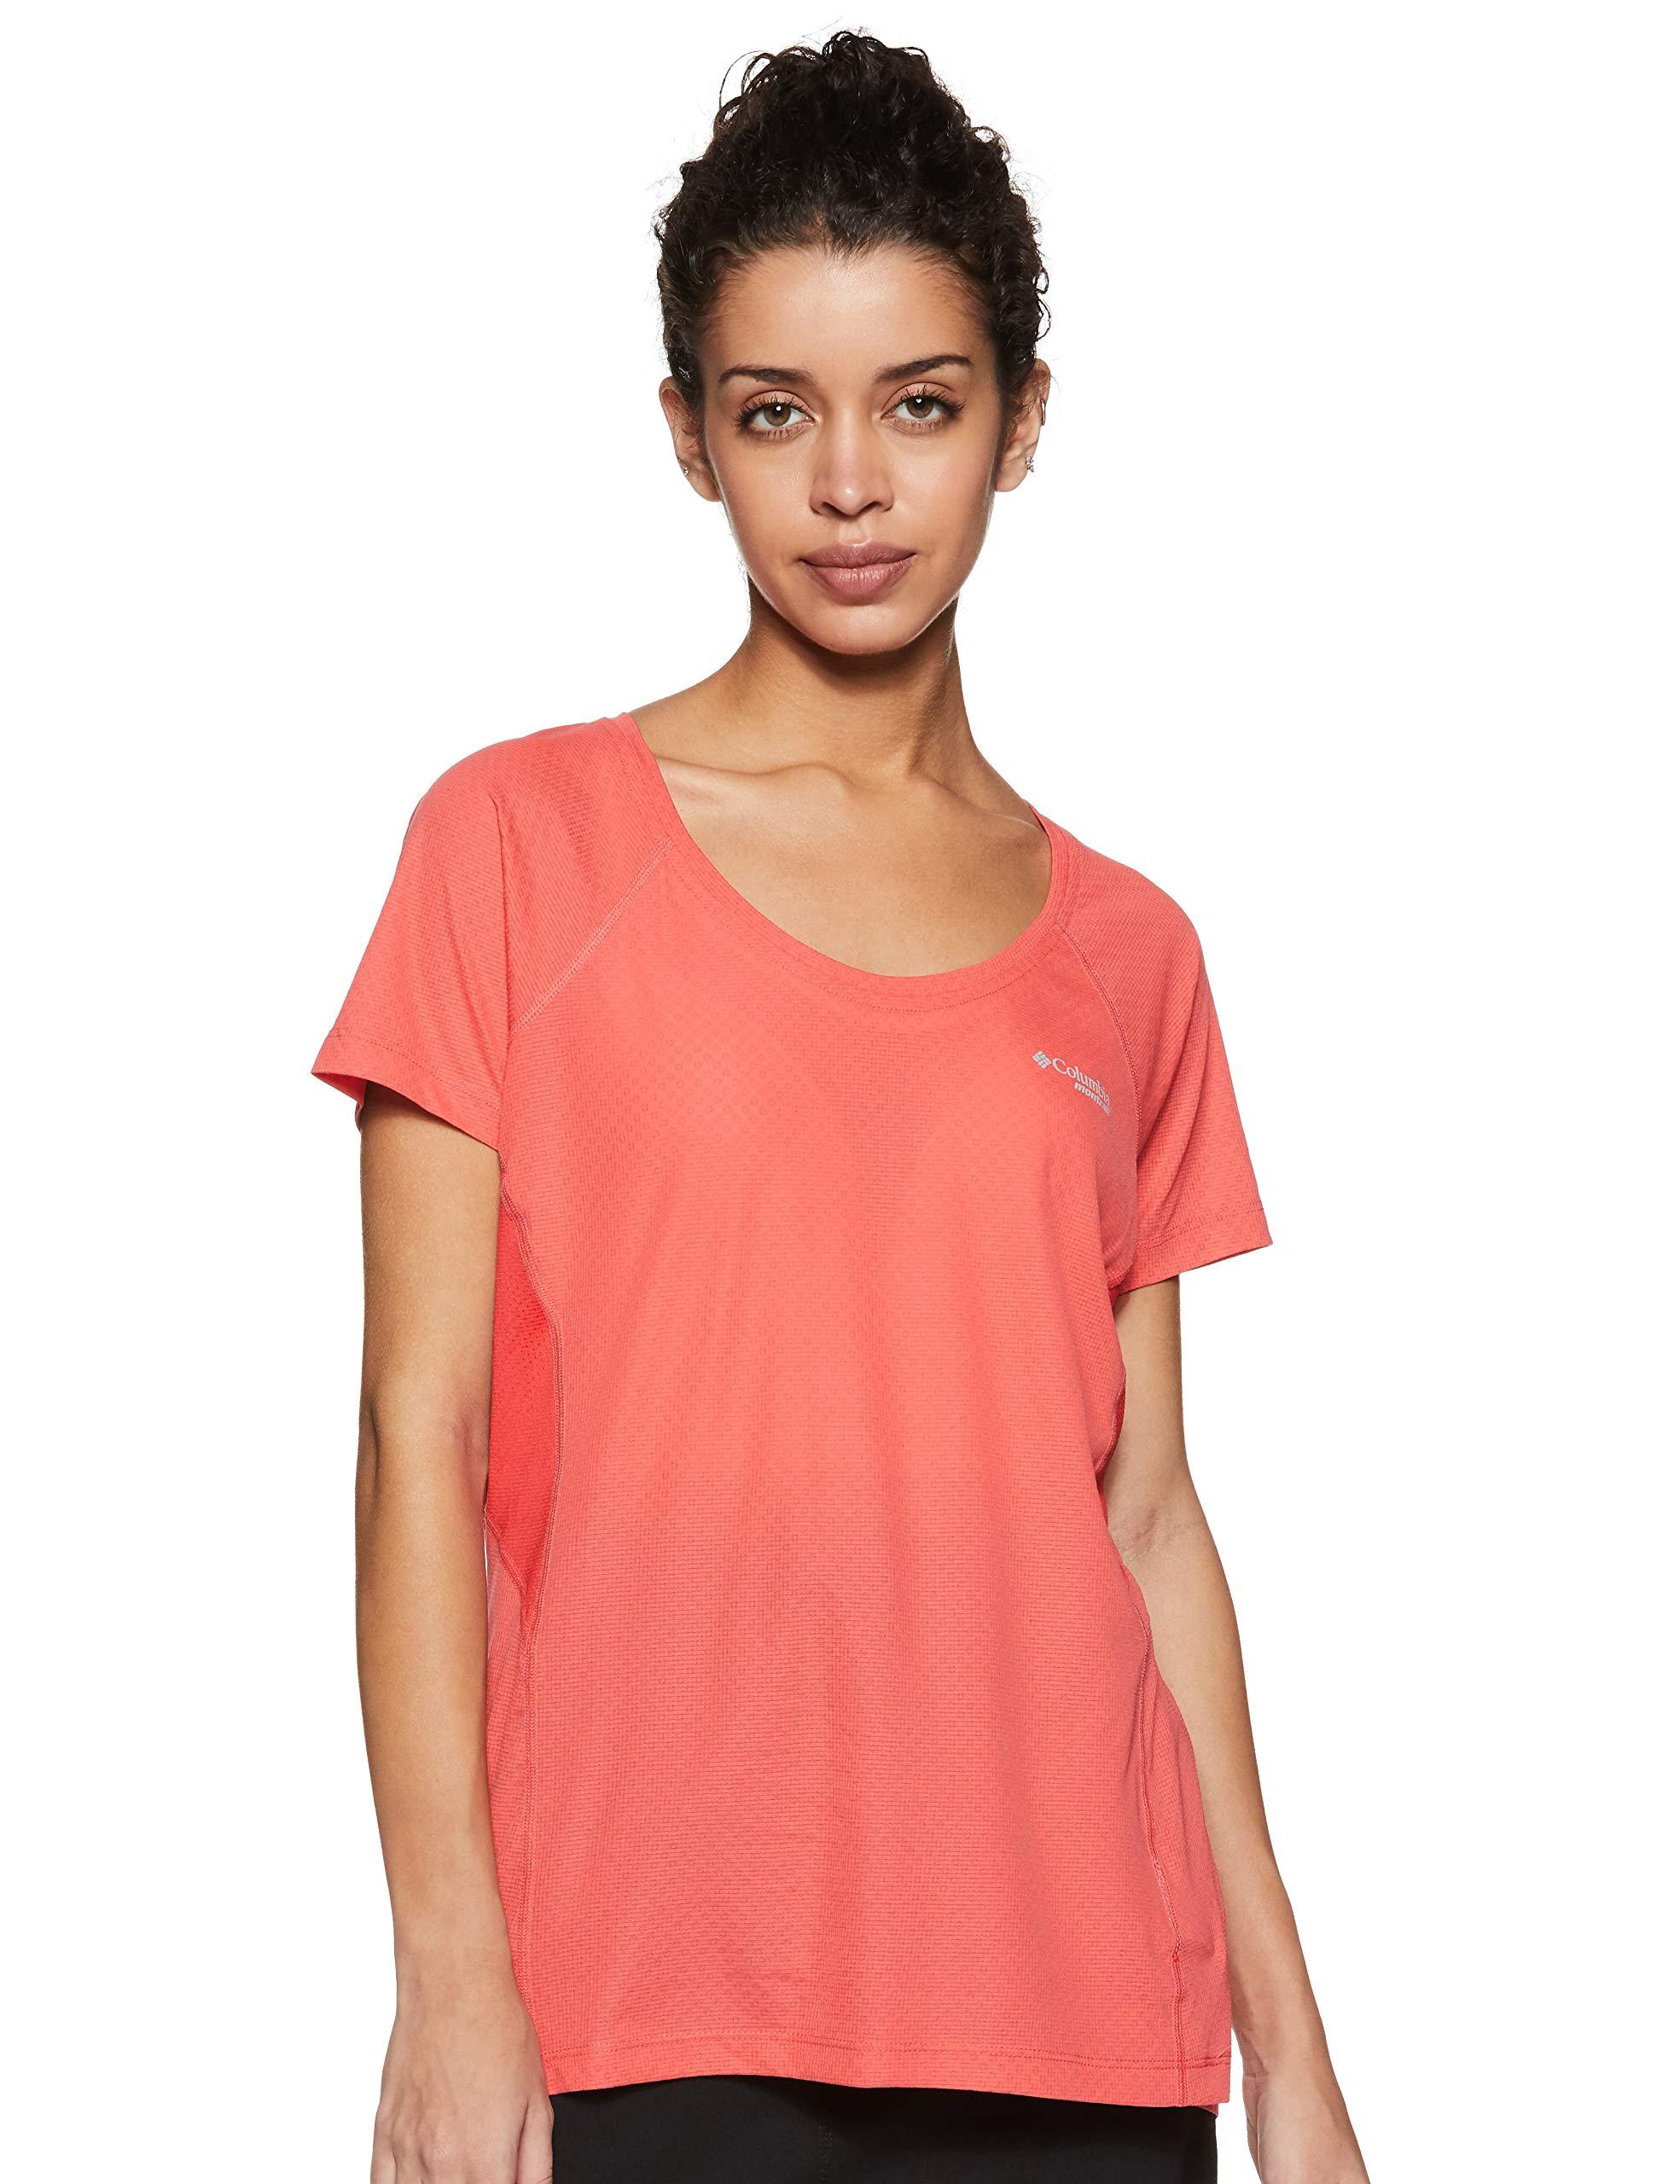 Columbia Damen T-Shirt Titan Ultra II Short Sleeve, Red Coral/Cherrybomb, M, 184